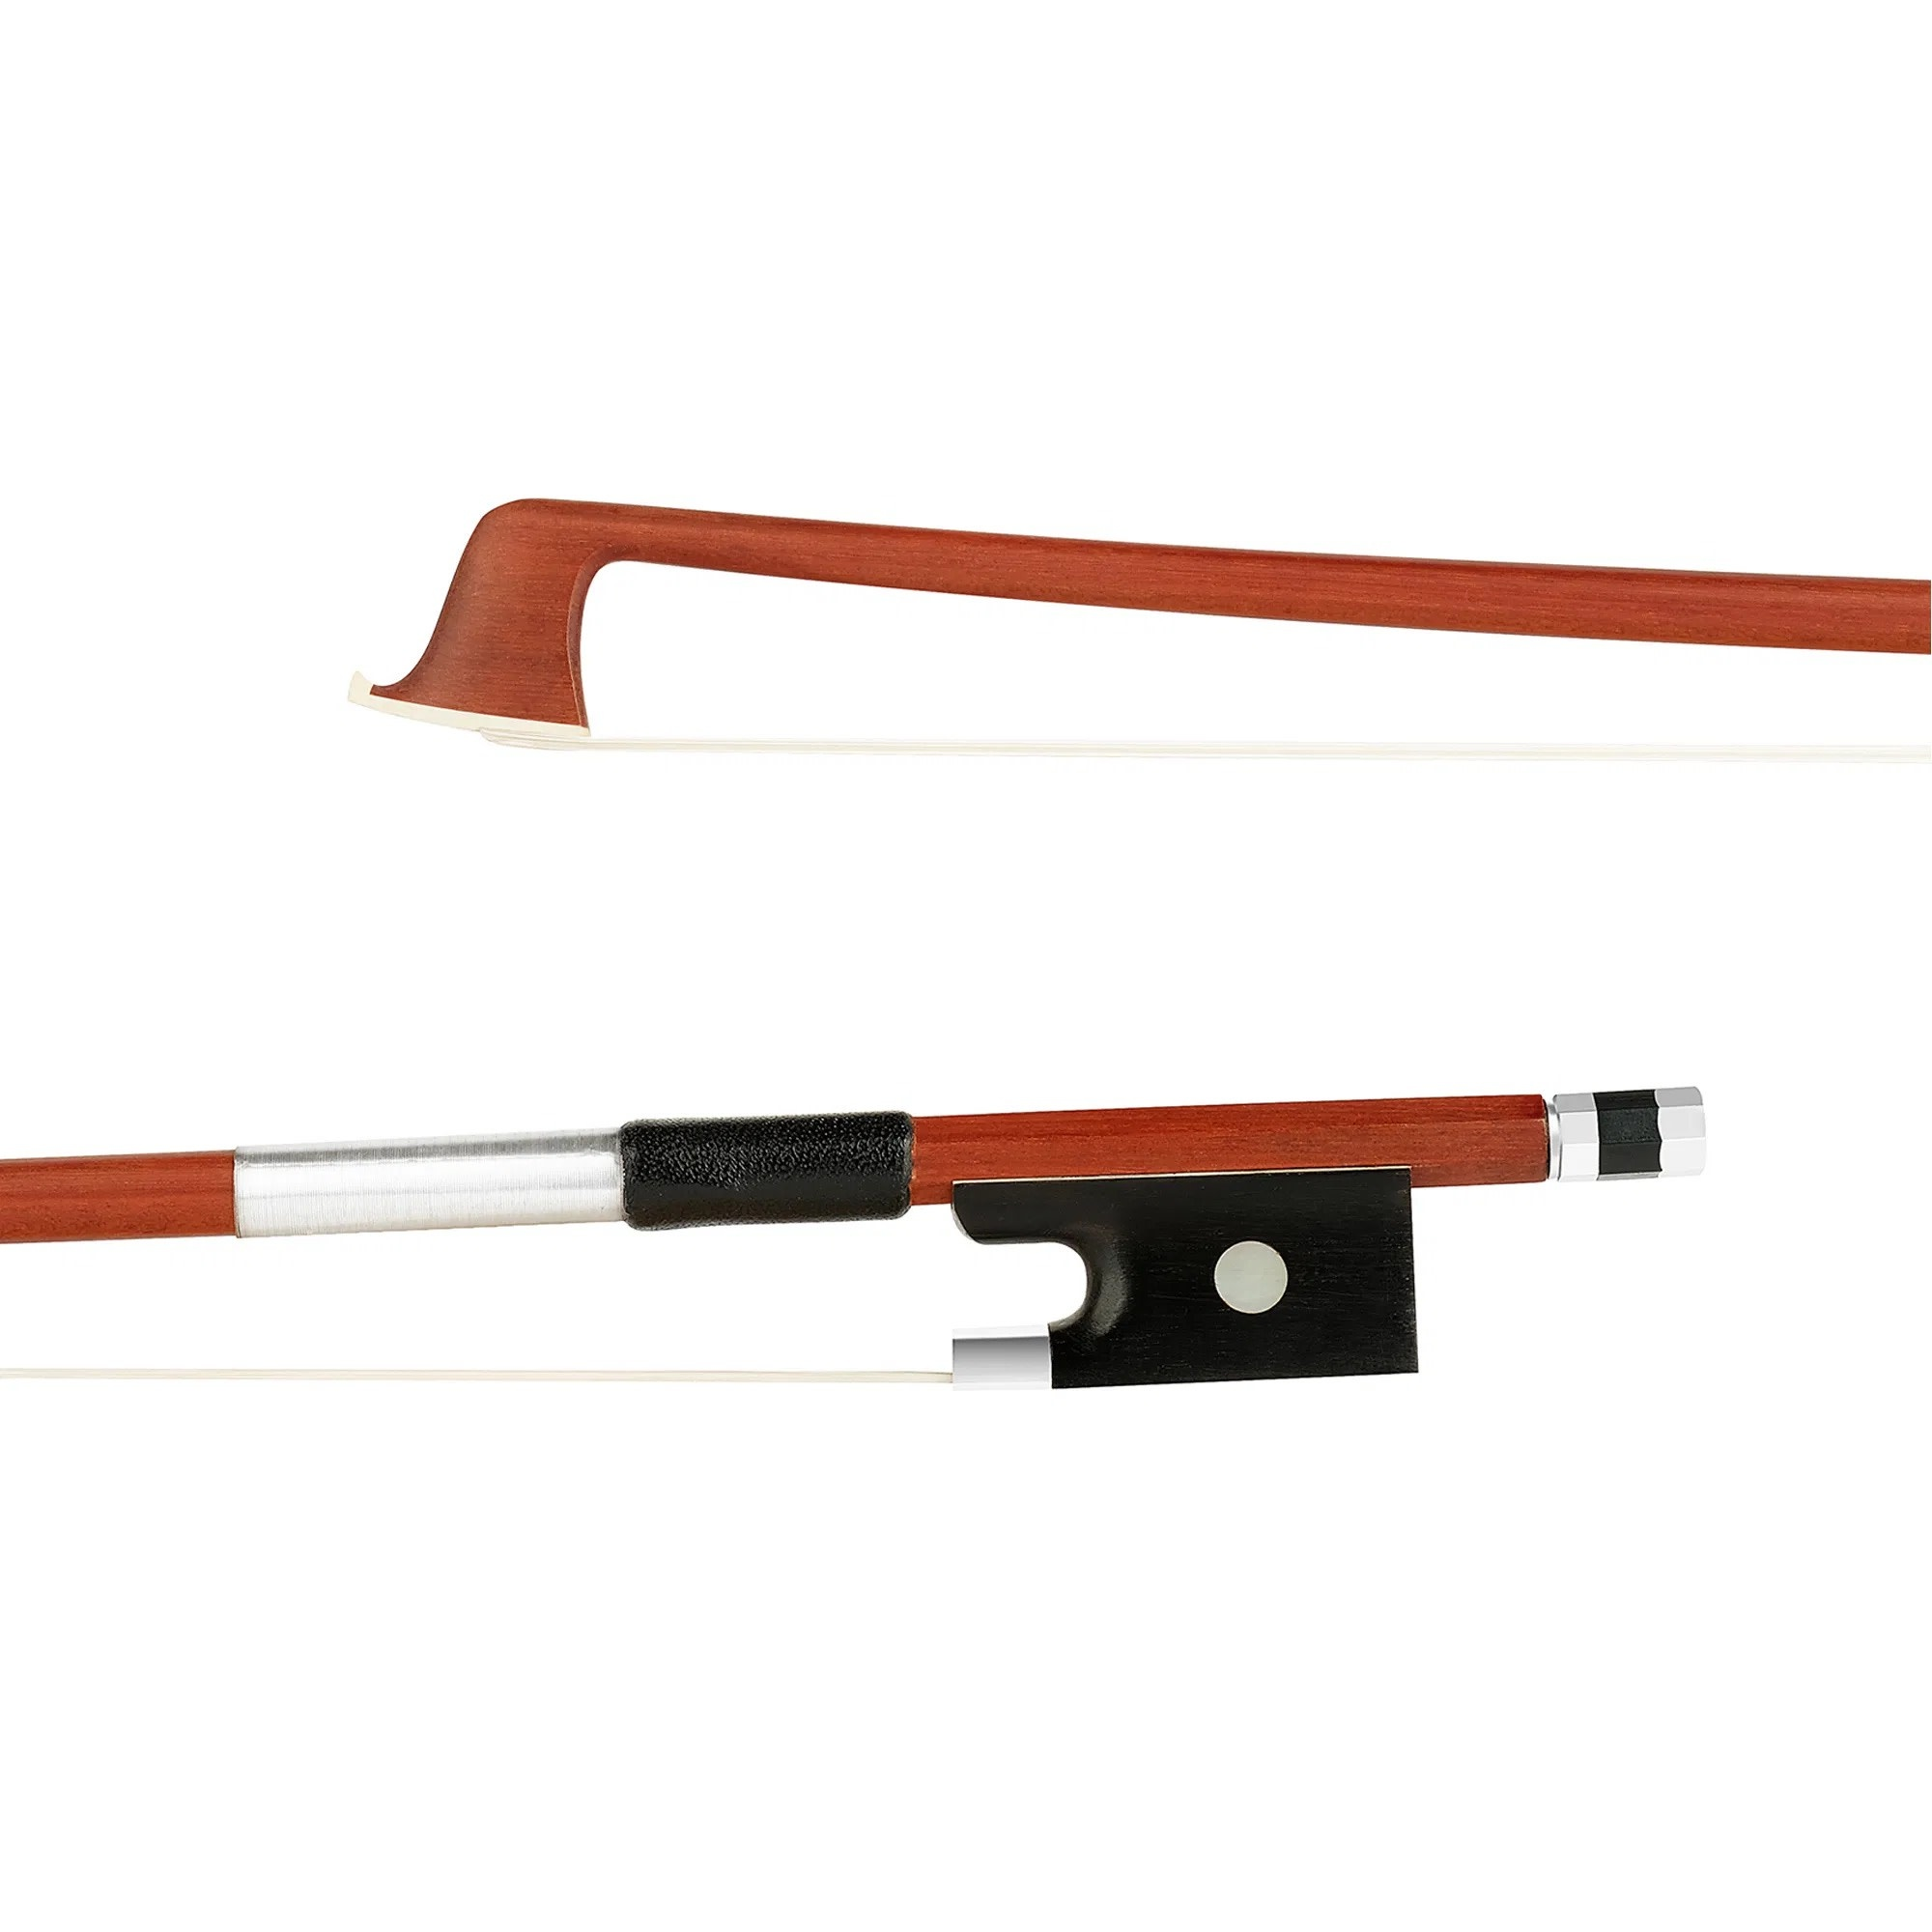 Student unbranded 4/4 Brazilwood half-lined student violin bow, nickel